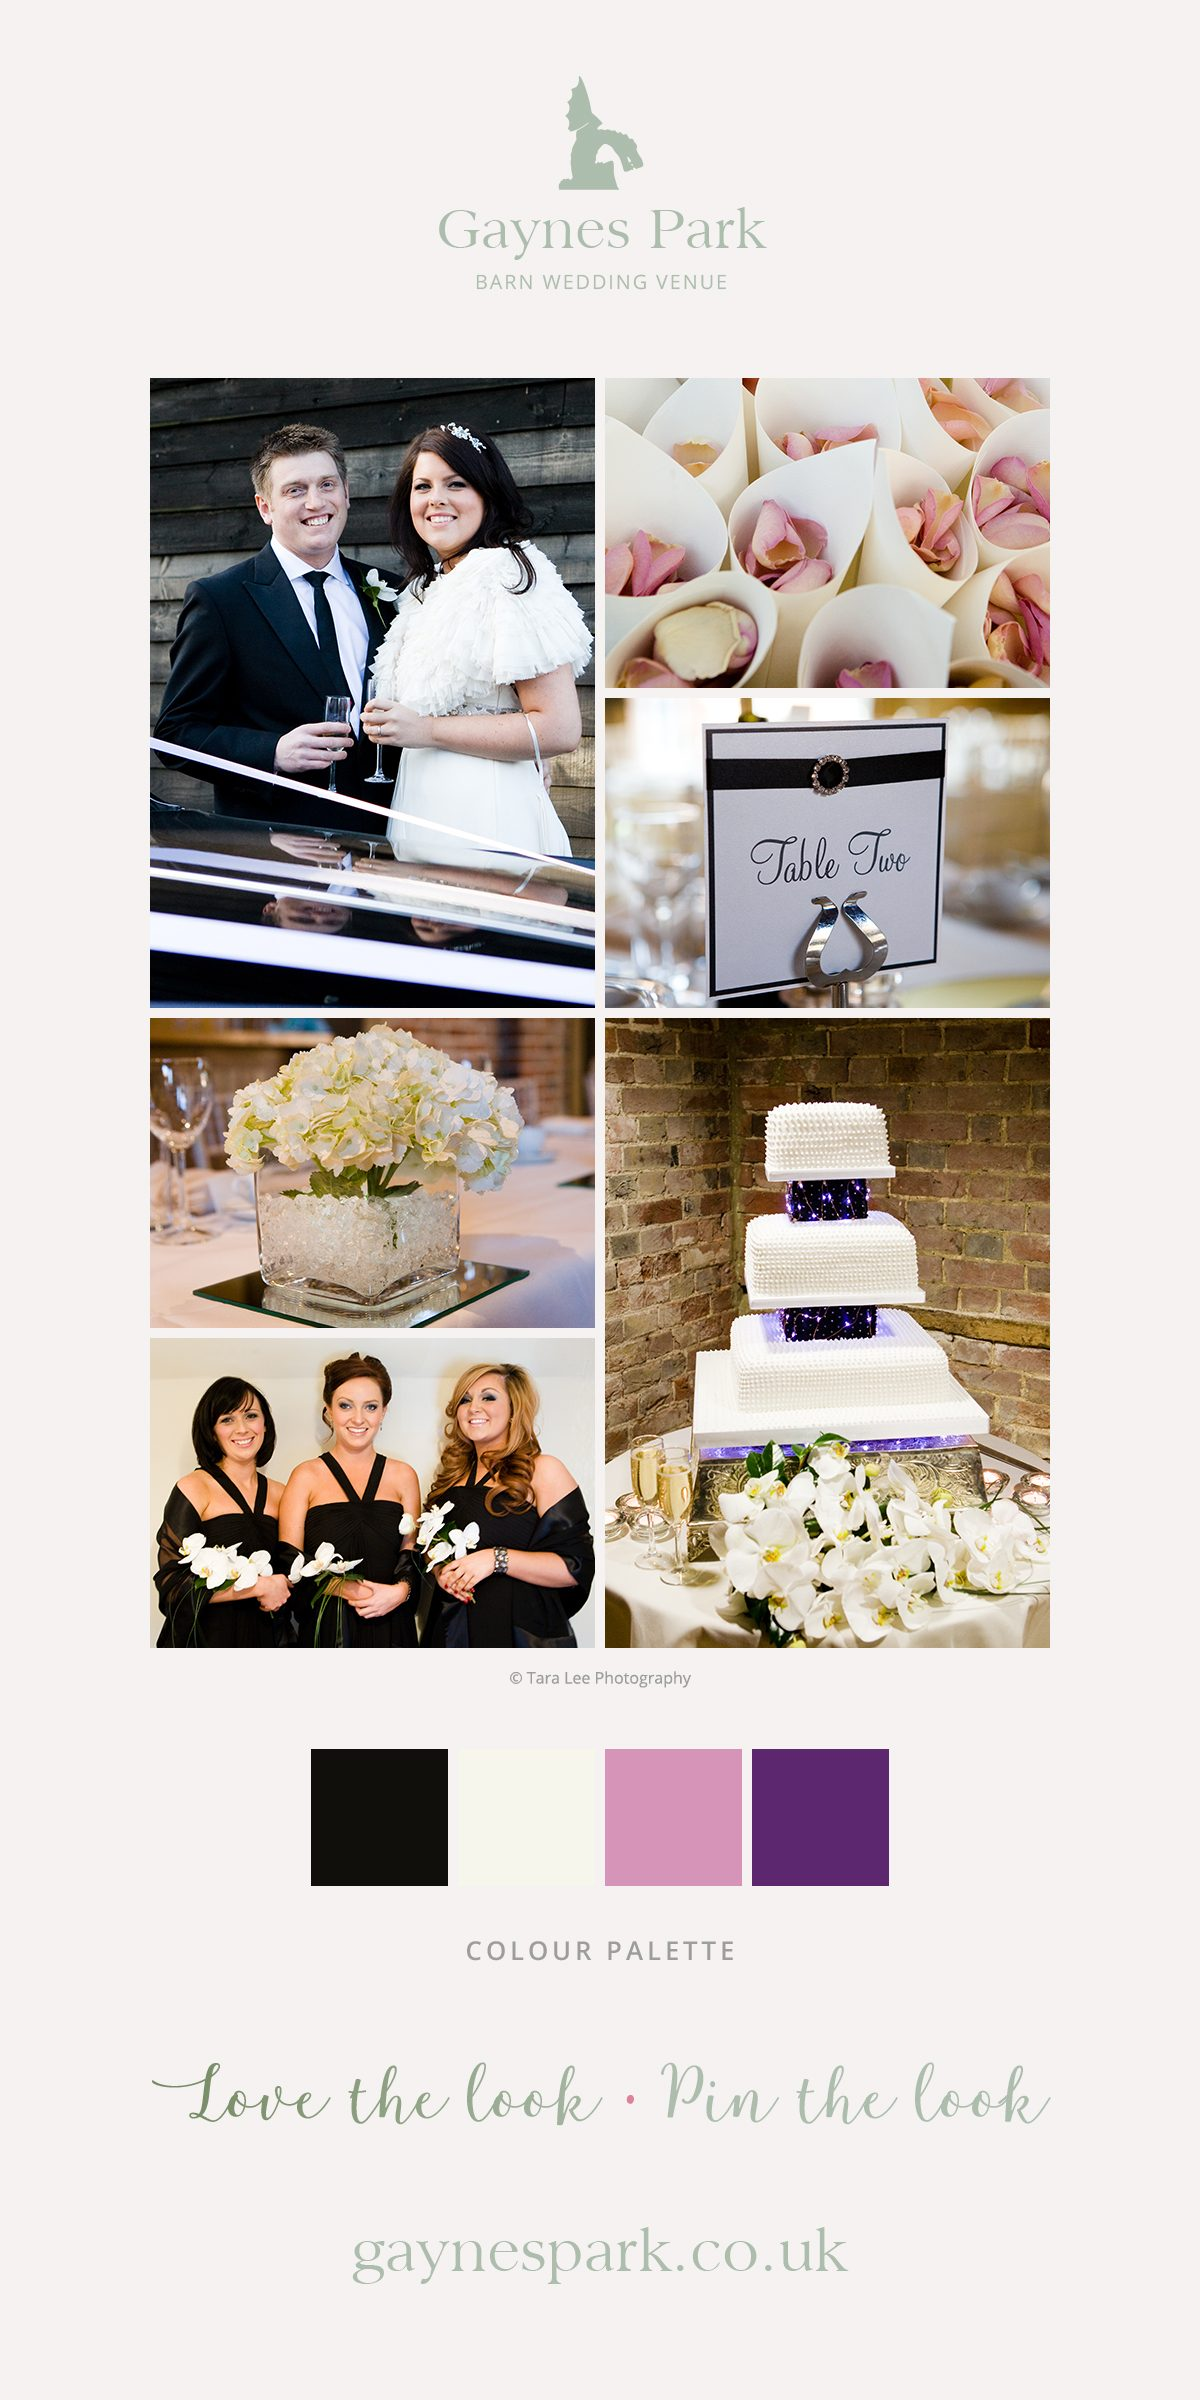 Ashley and Steven's real life wedding at Gaynes Park